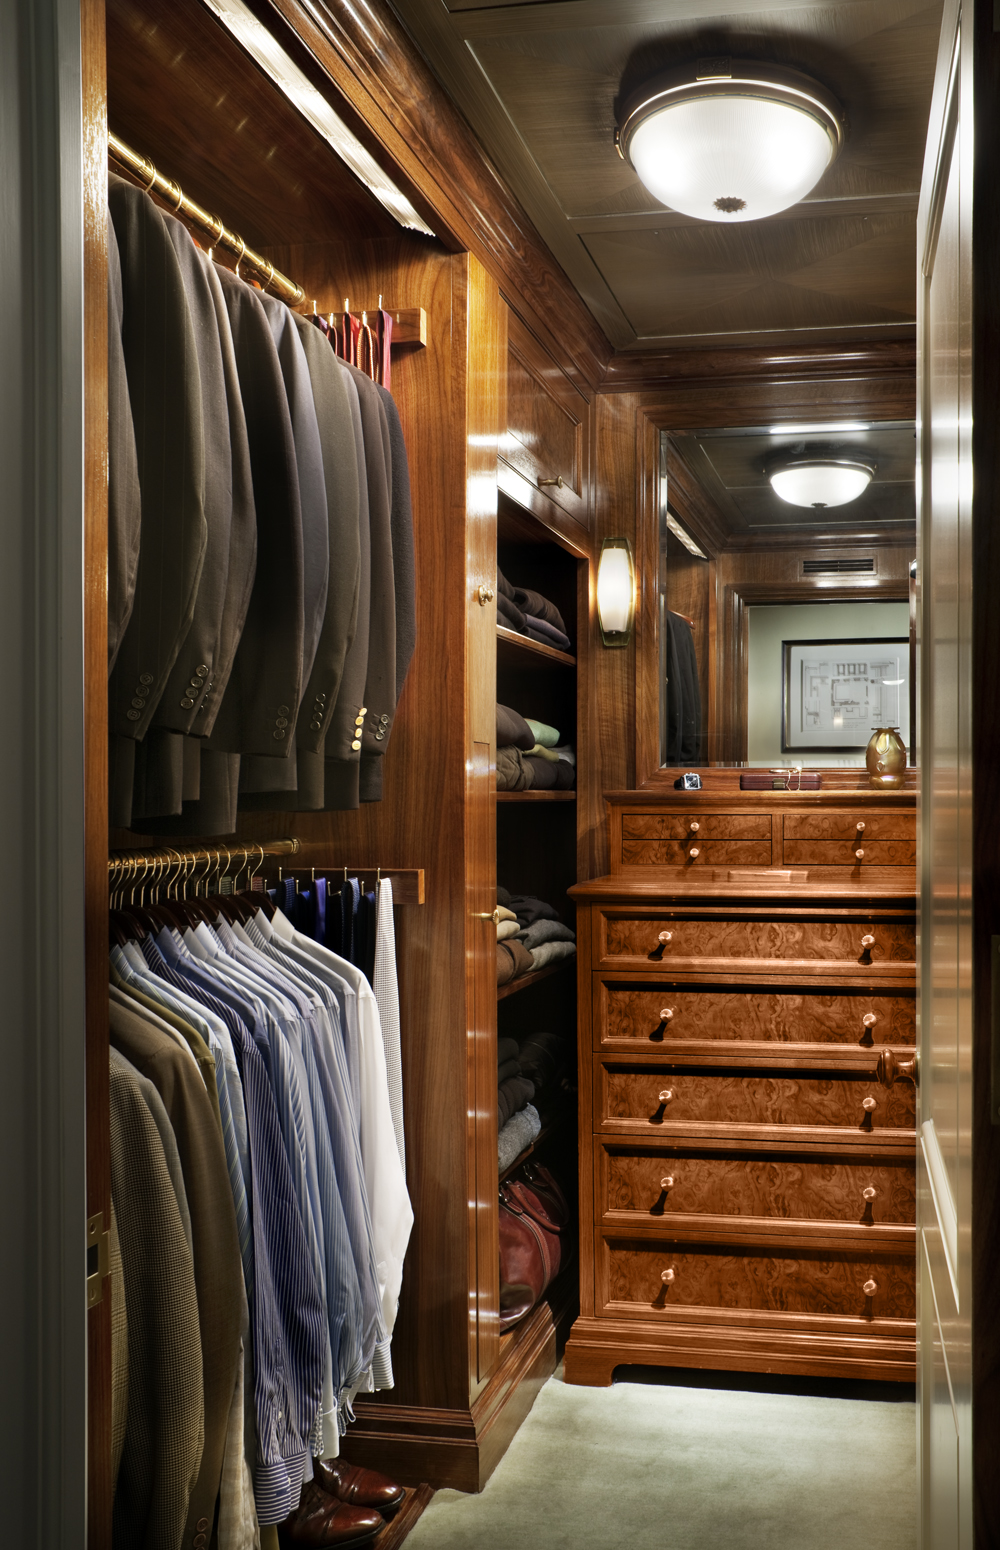 LSI-web-fifth-ave-interior-closet-2.jpg